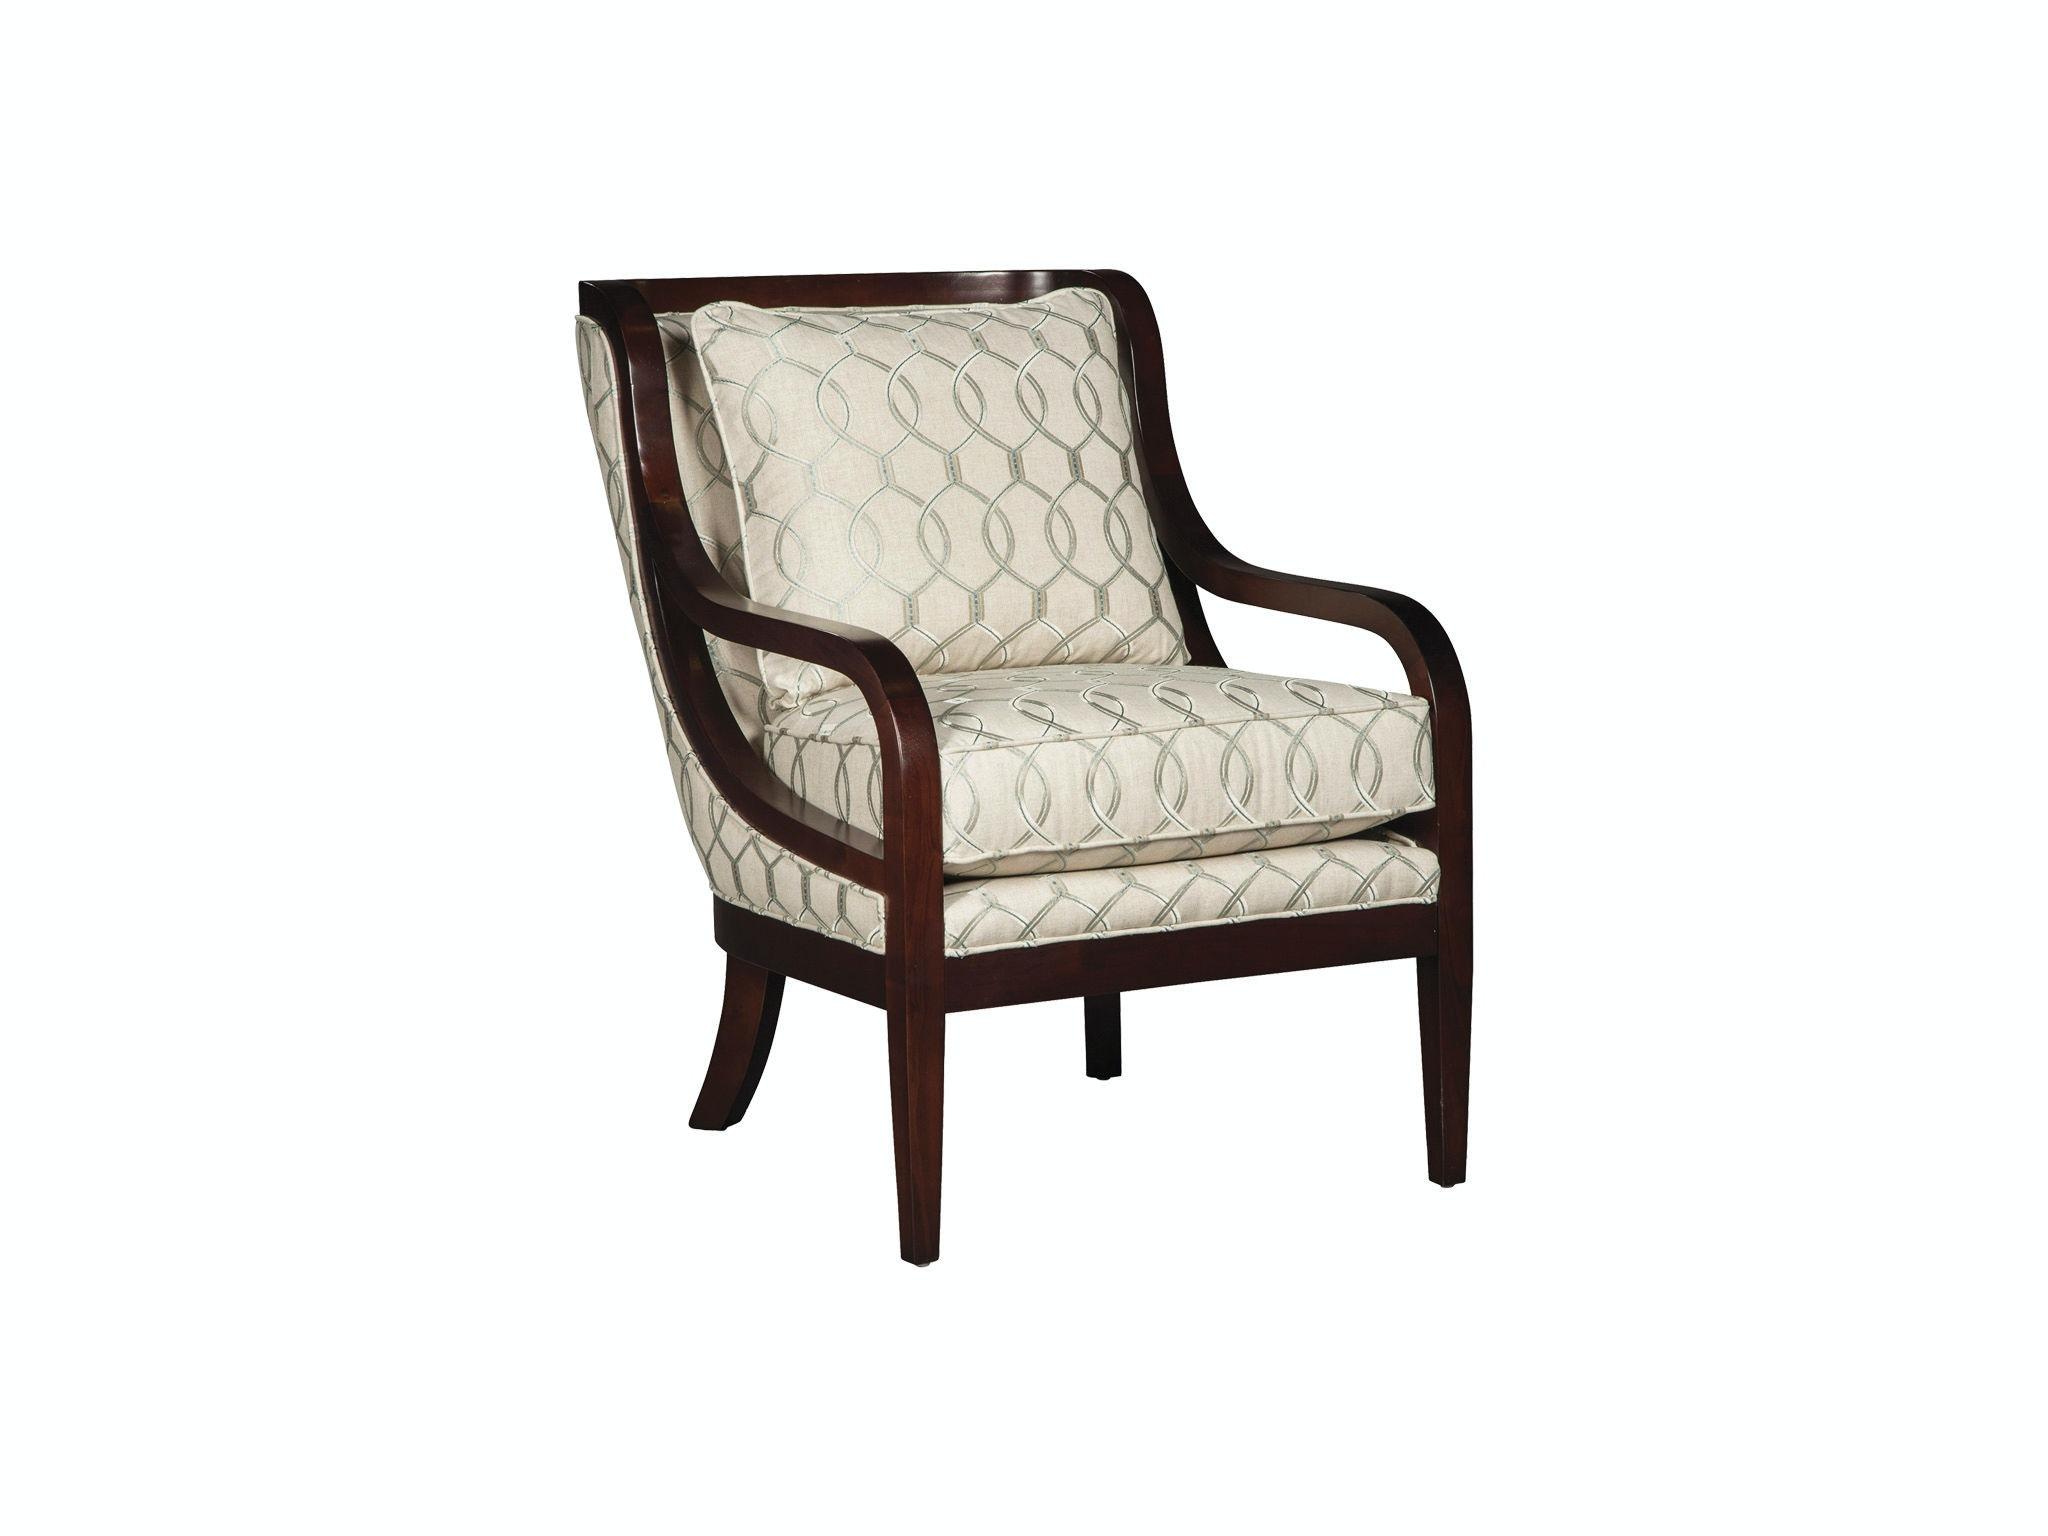 Hickorycraft Living Room Chair 067410